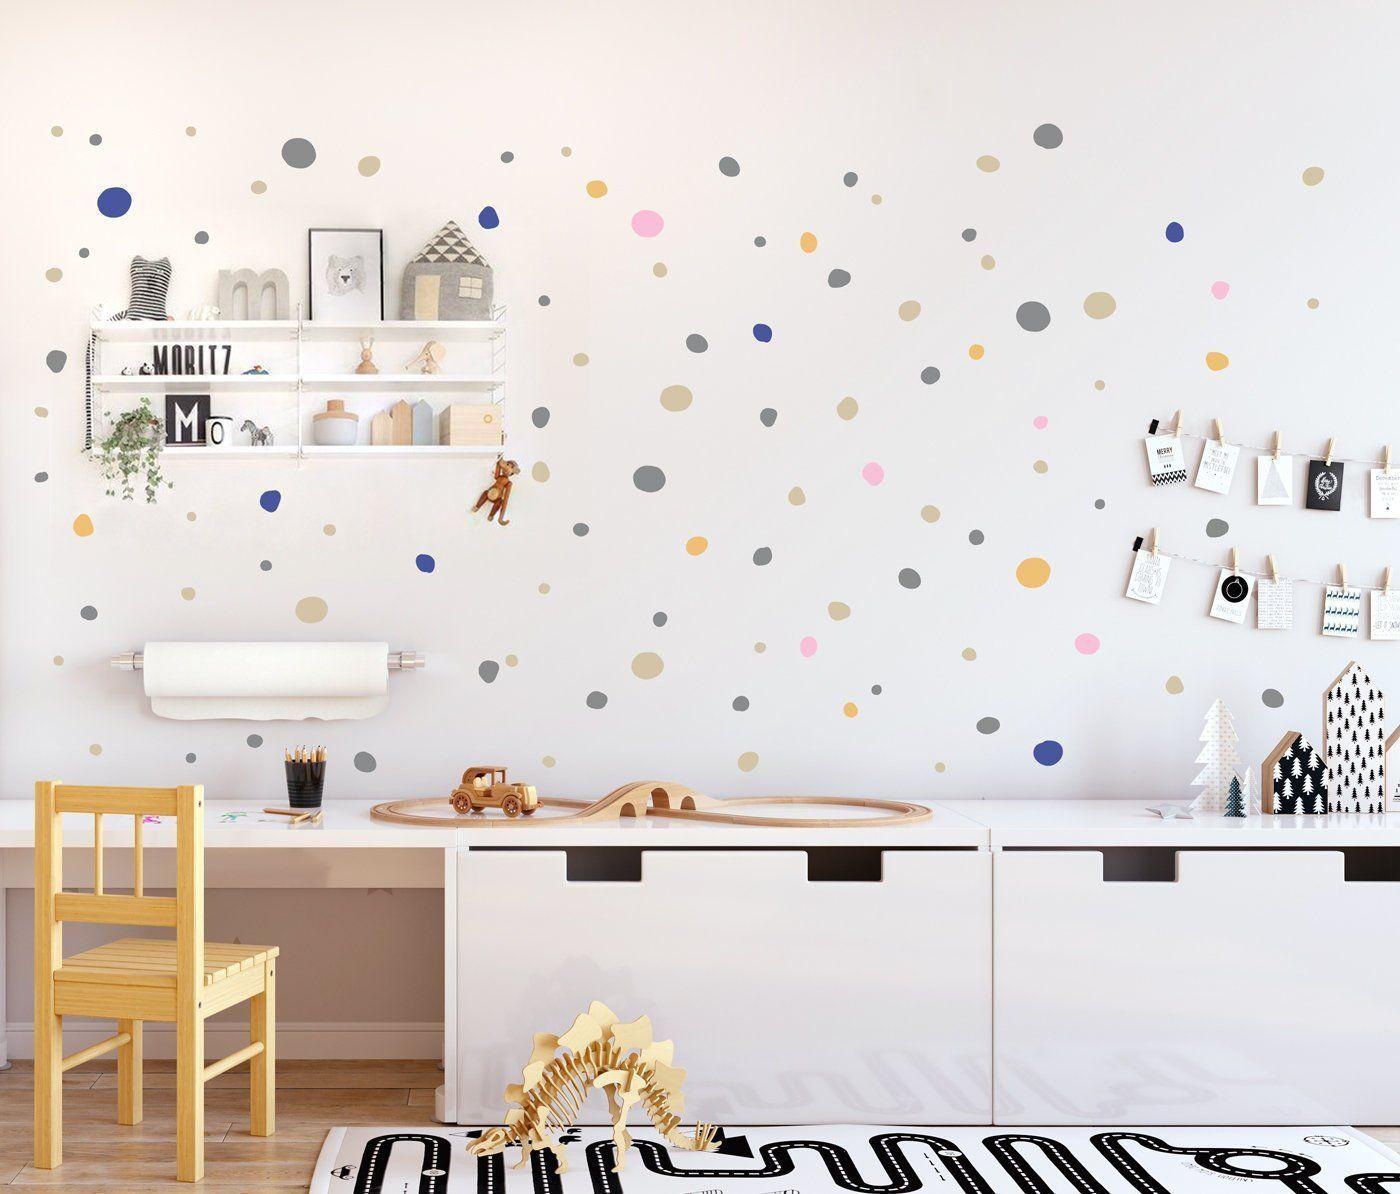 Full Size of Wandaufkleber Kinderzimmer Hand Drawn Polka Dots Wall Decals Multicolored Regal Sofa Weiß Regale Kinderzimmer Wandaufkleber Kinderzimmer